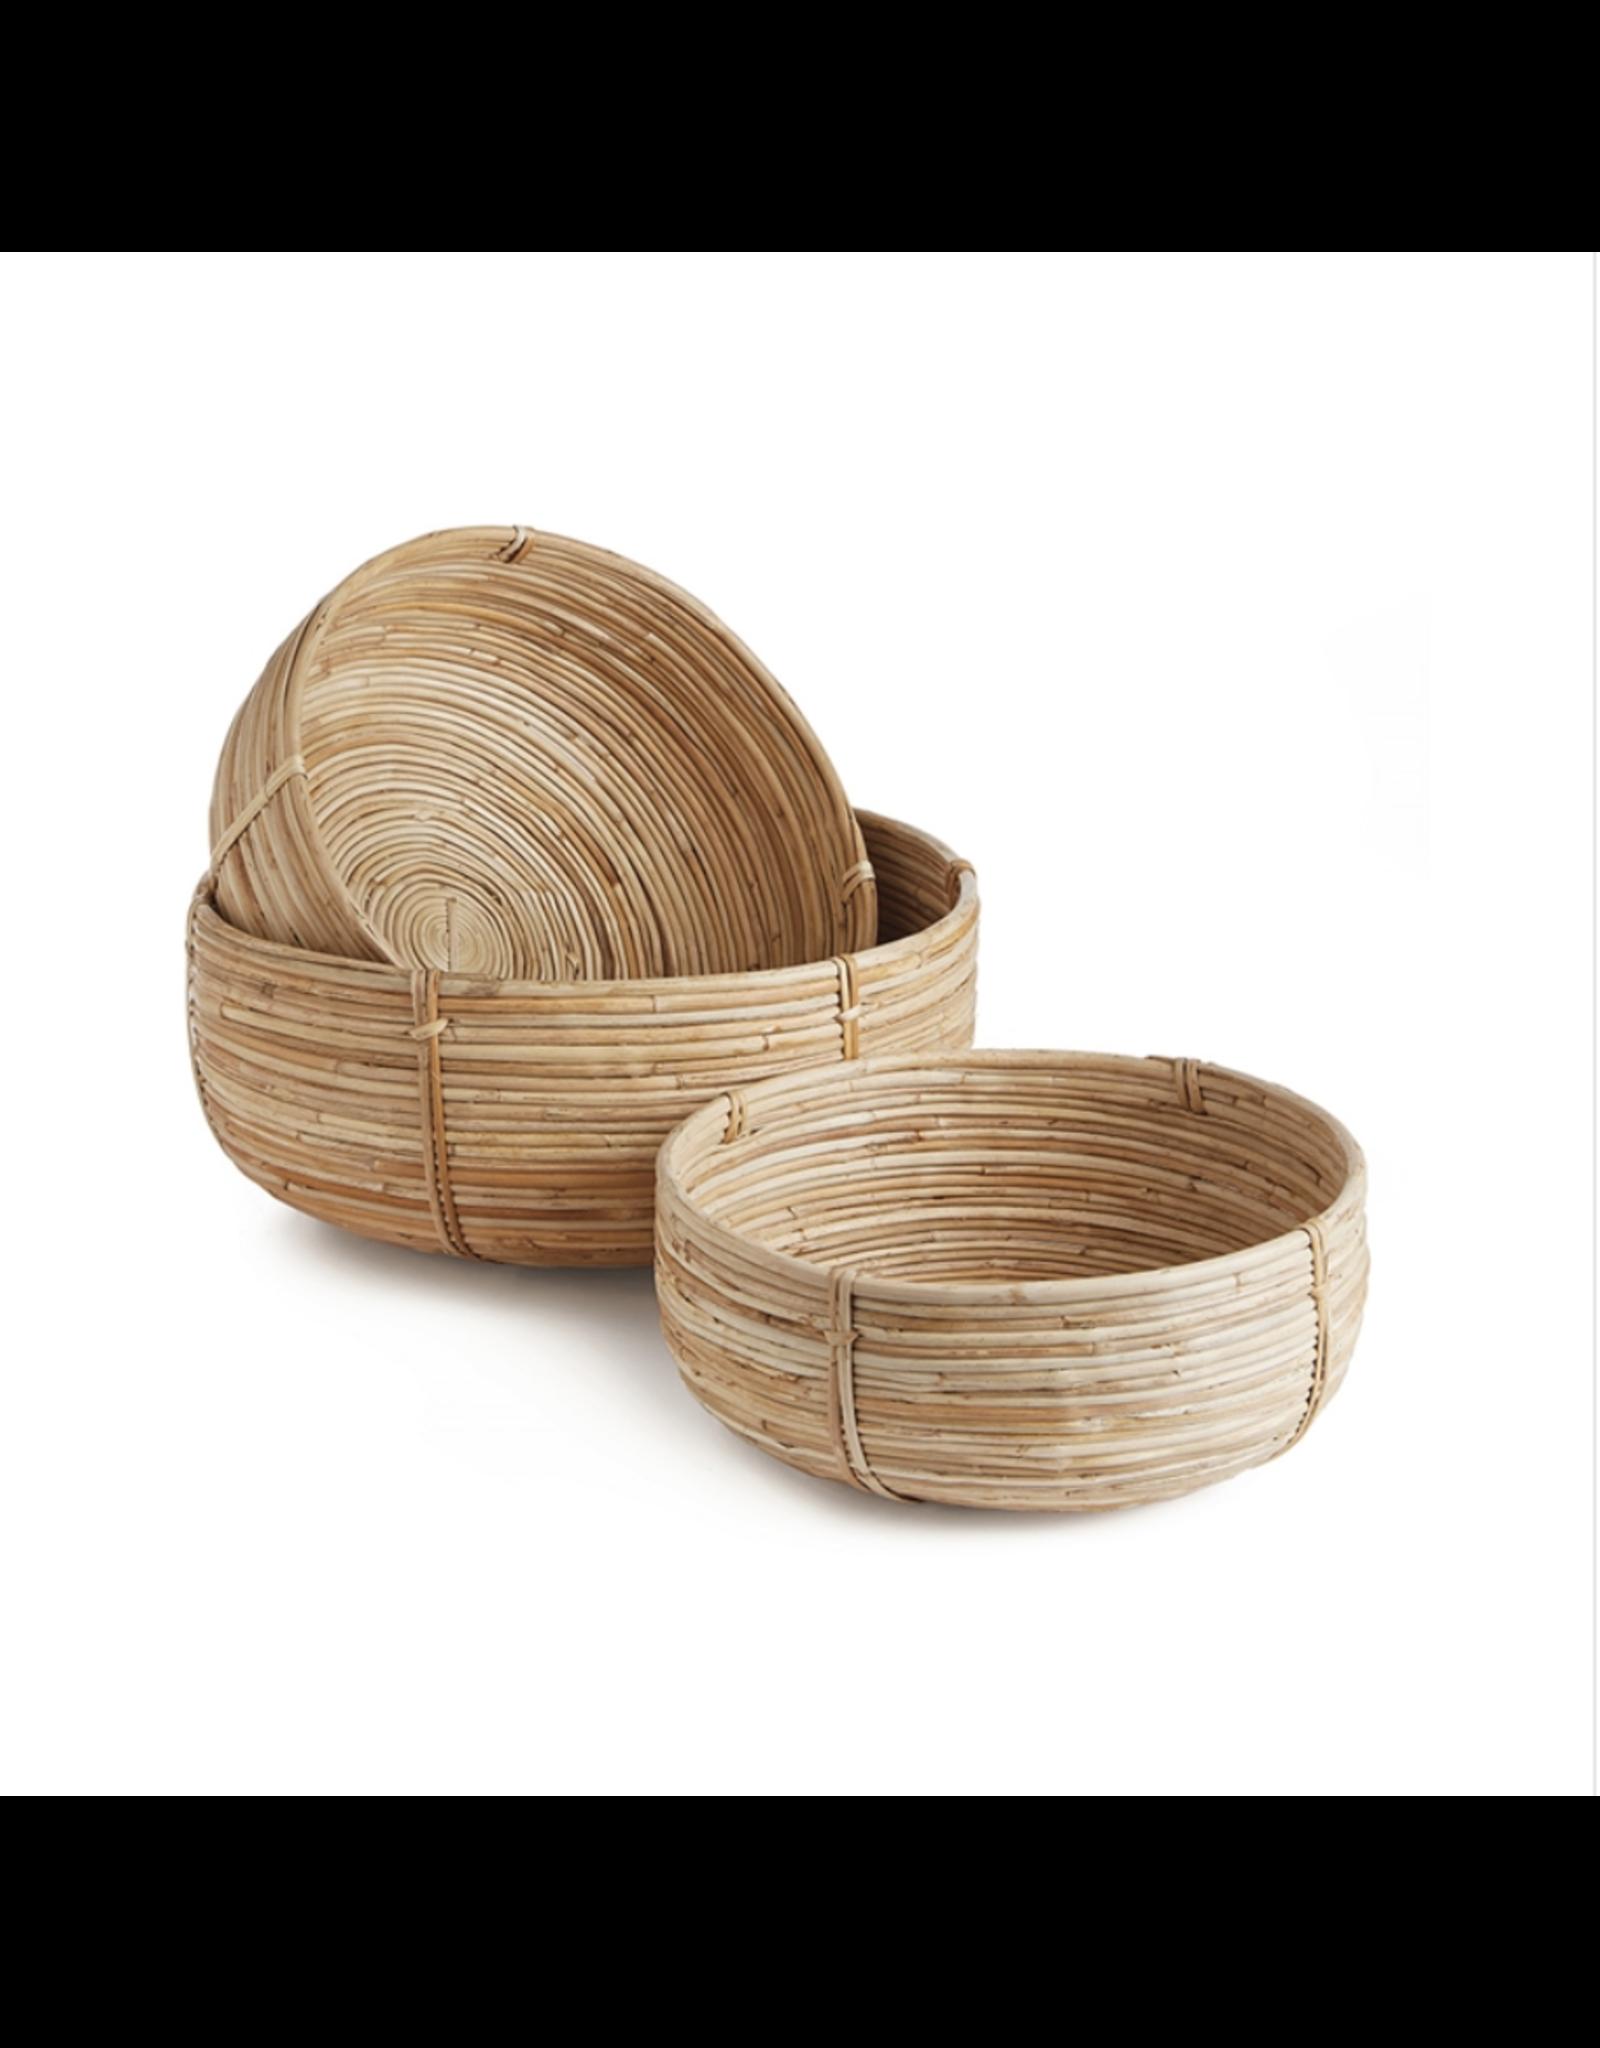 Oak + Arrow Interiors Cane Low Basket Small